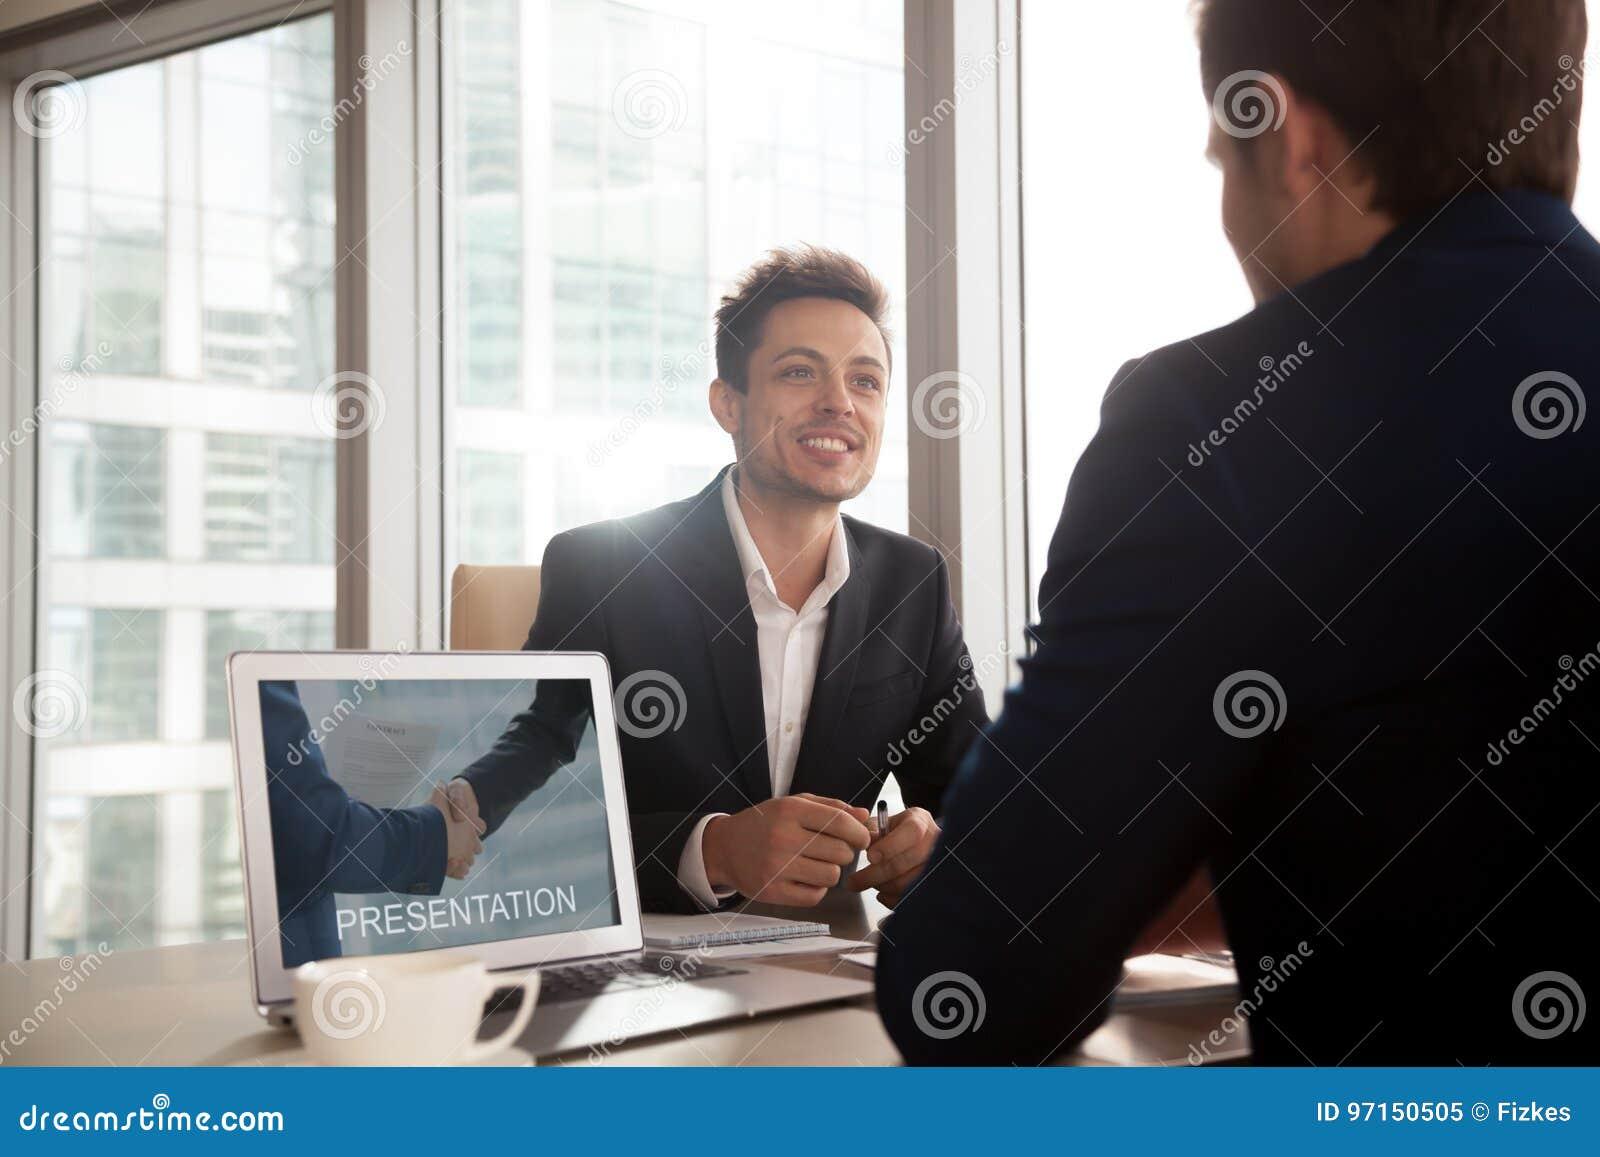 Smiling investment broker showing presentation on laptop screen